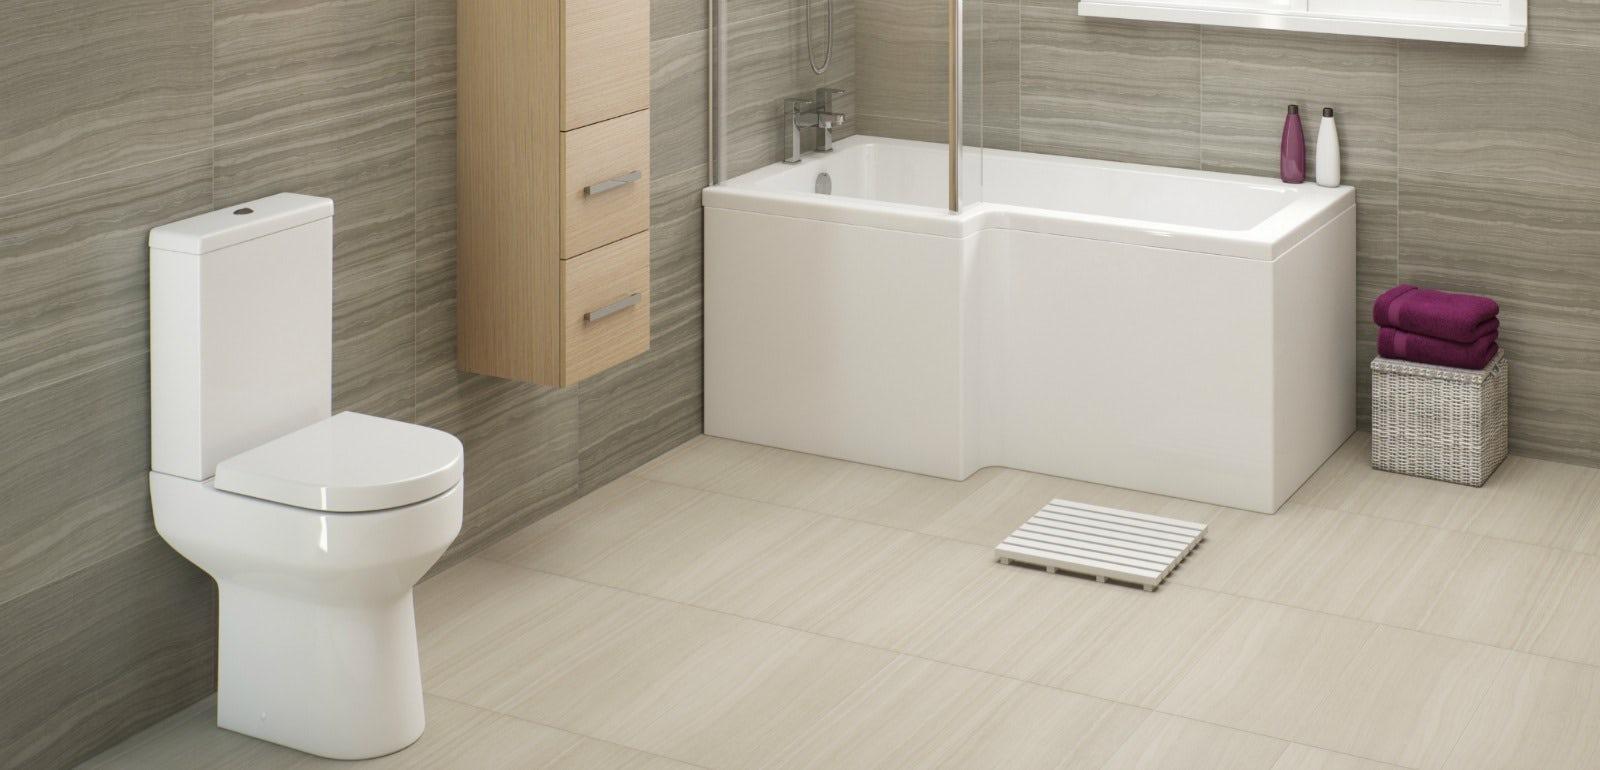 3 design tips for your new bathroom VictoriaPlumcom